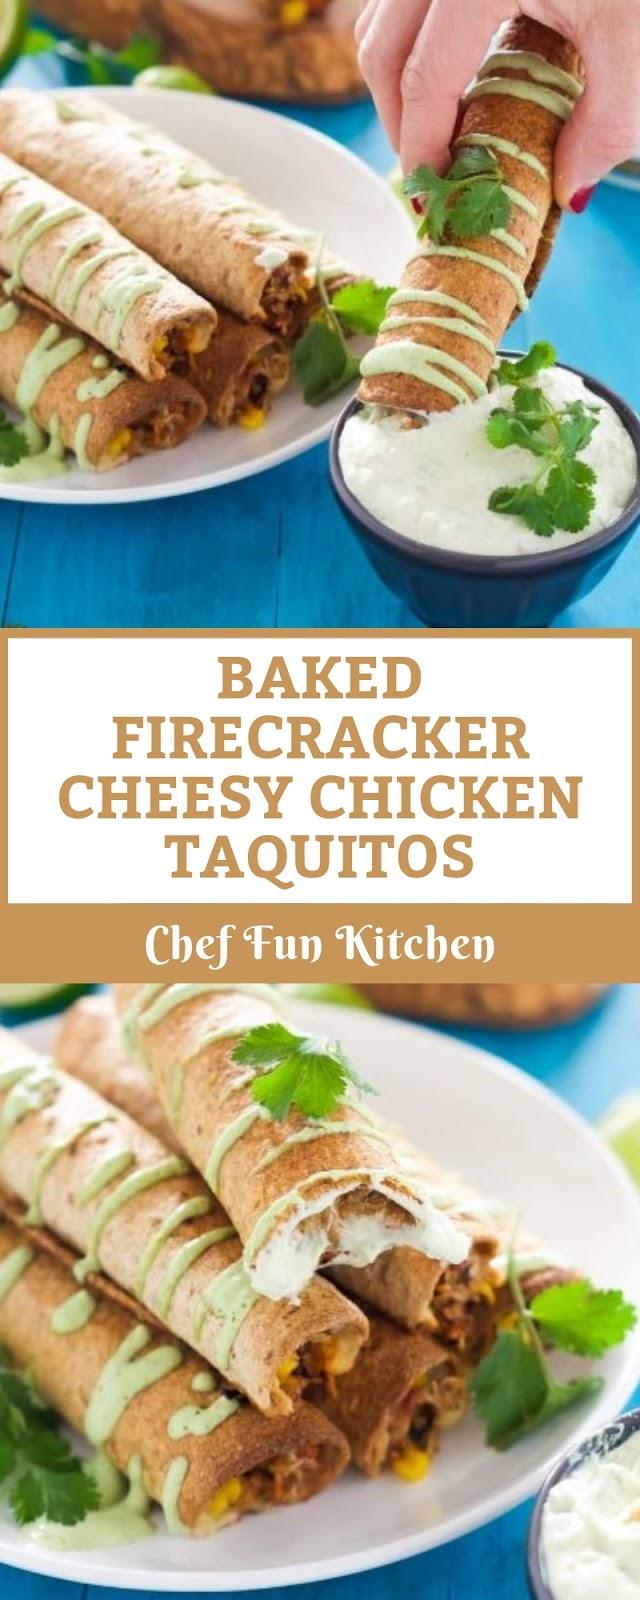 BAKED FIRECRACKER CHEESY CHICKEN TAQUITOS